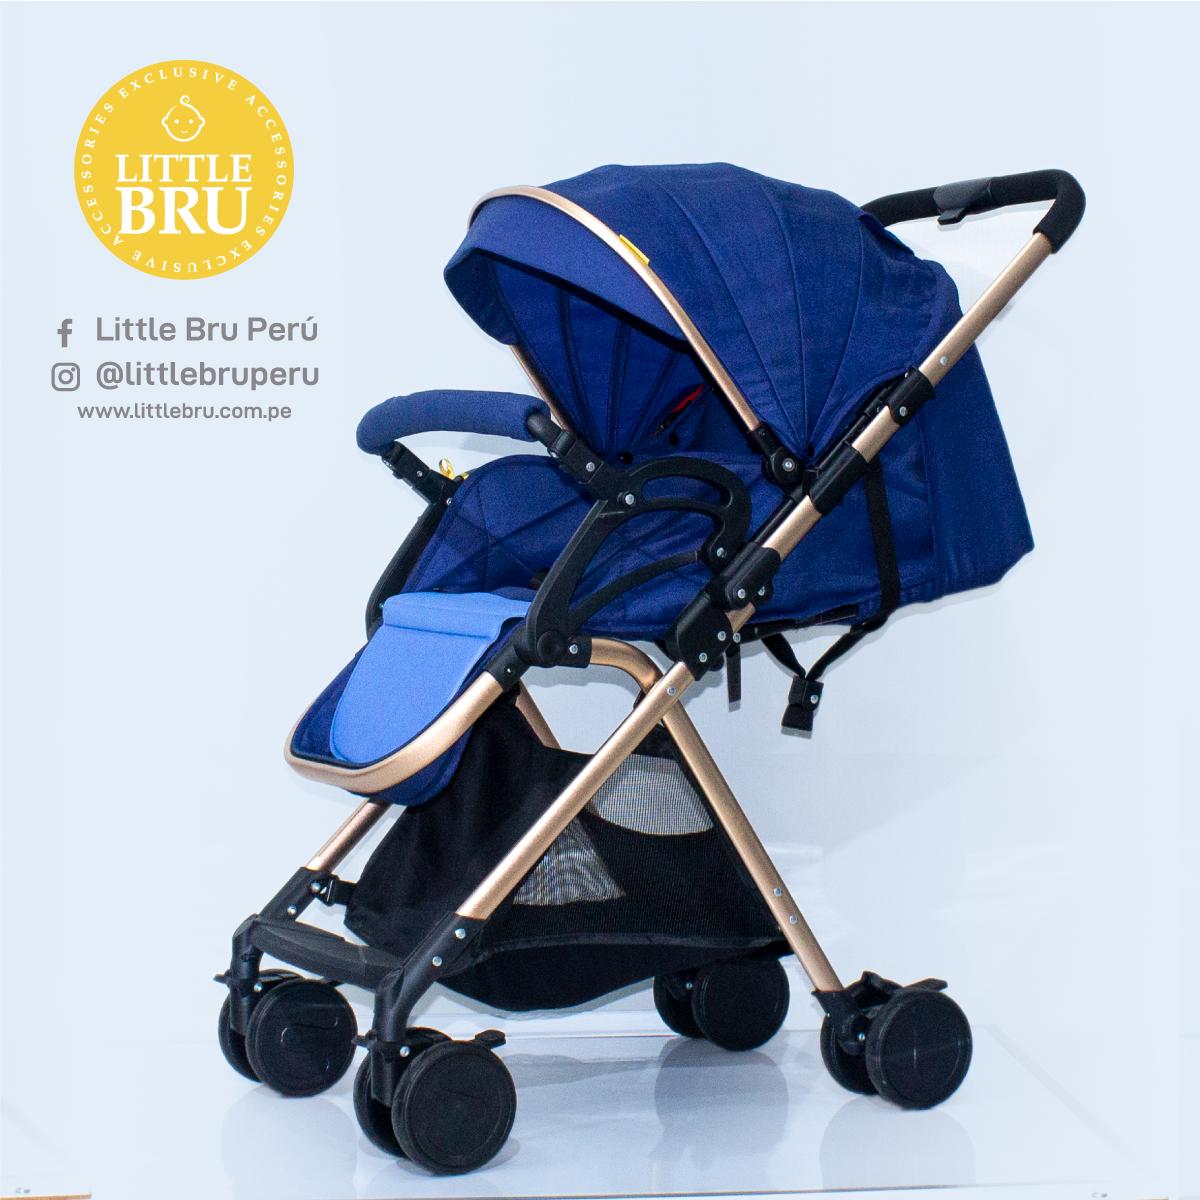 610b027dc LittleBru, productos exclusivos para bebés : Coche Little Bru Mod ...